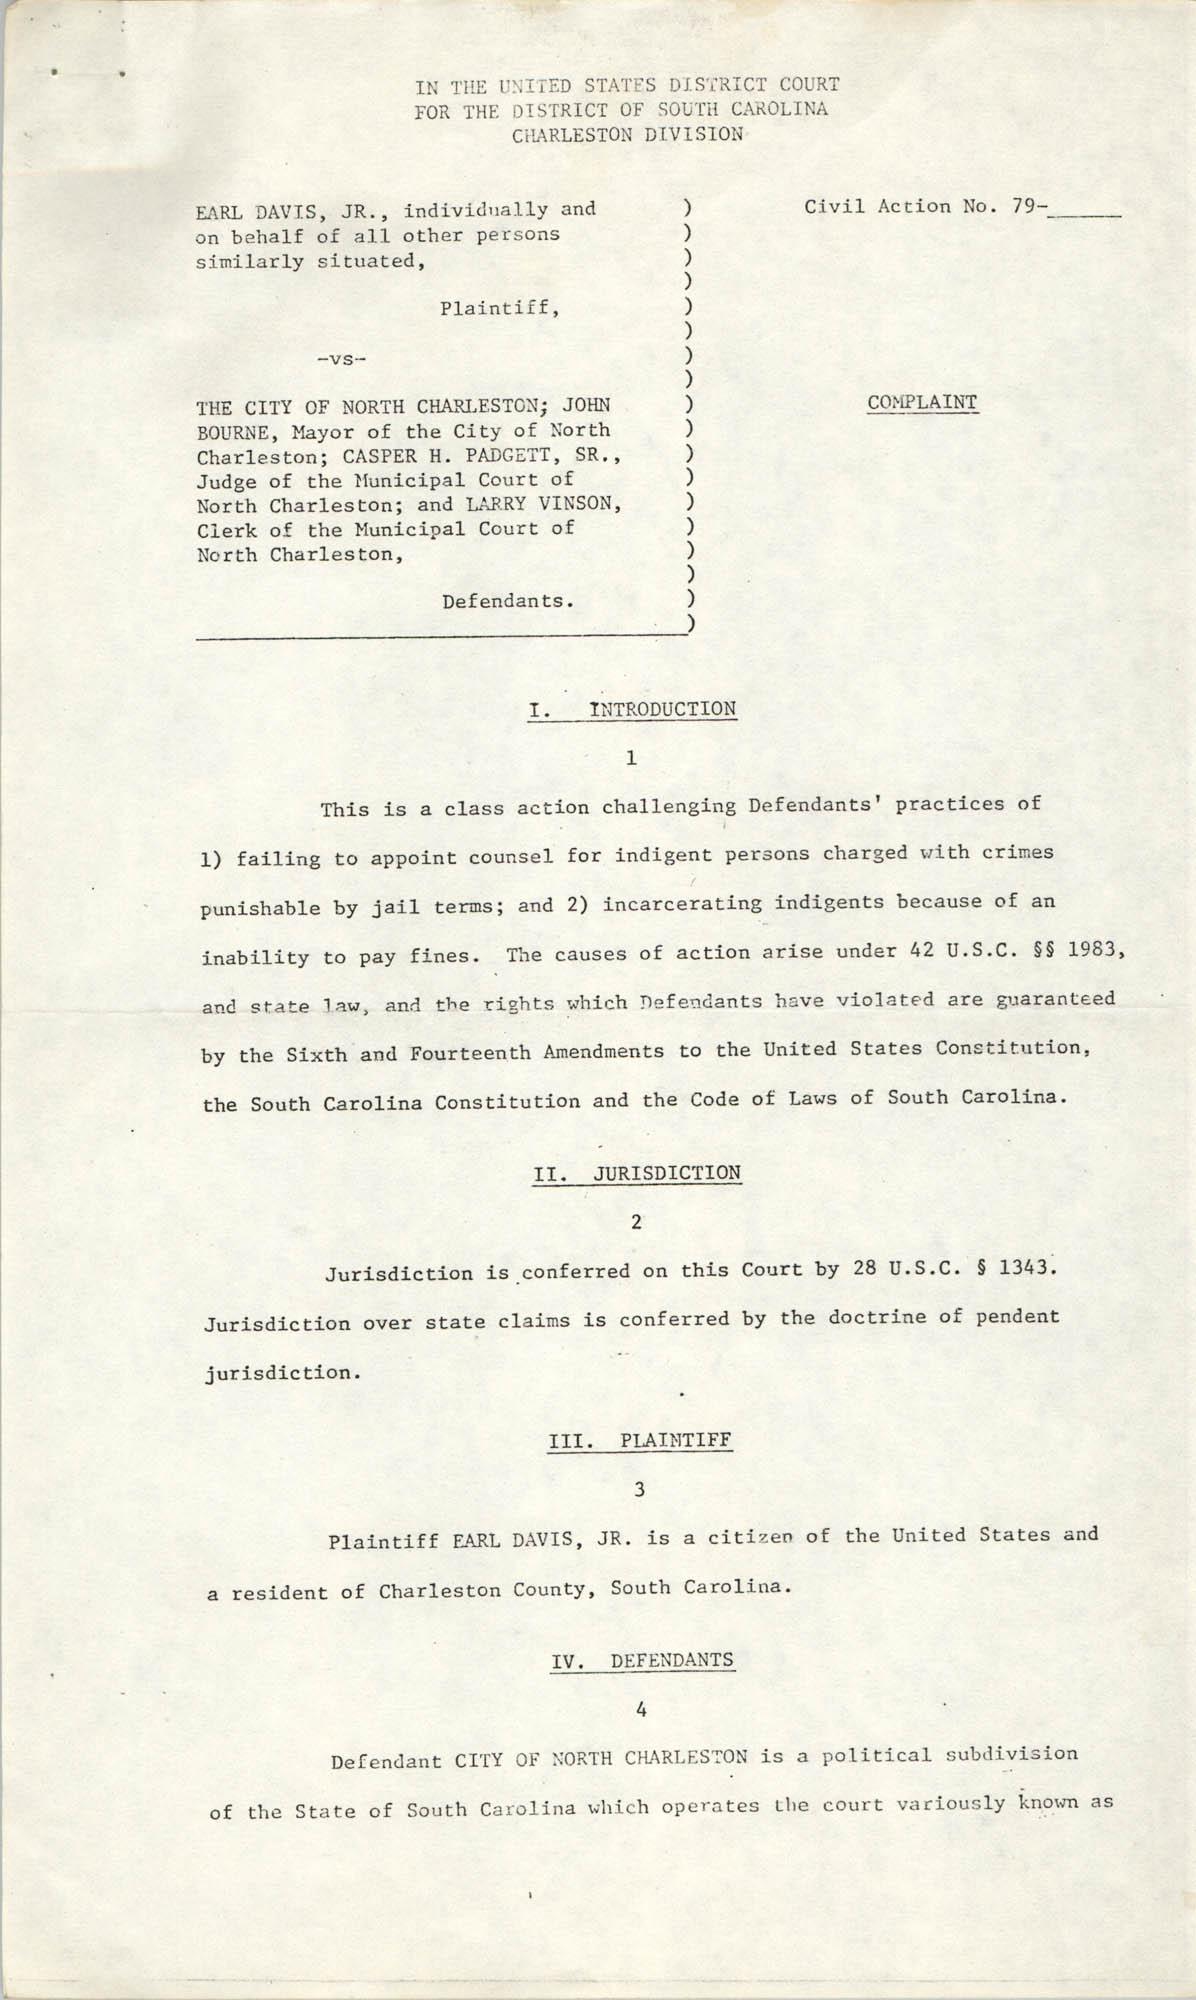 Civil Action No. 79-1042 Verification, Charleston Division, Earl Davis, Jr. vs. The City of North Charleston